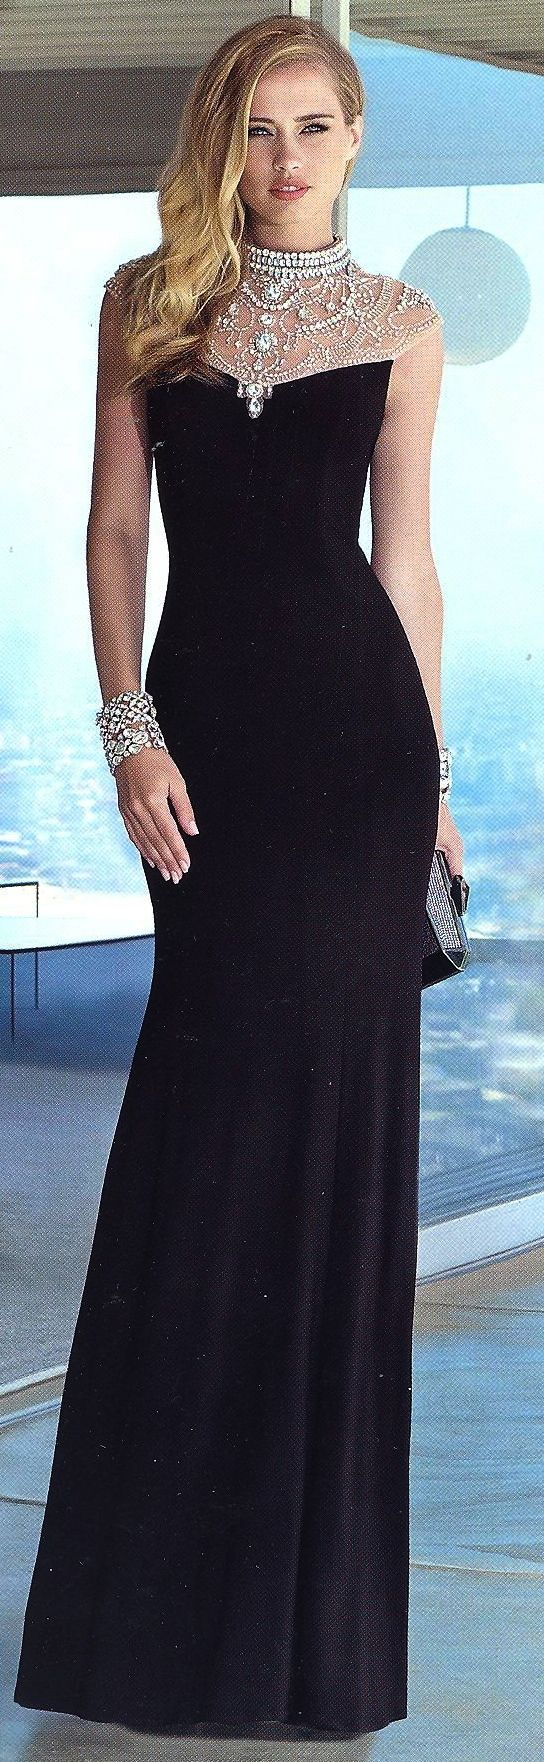 Very Elegant. Beauty.